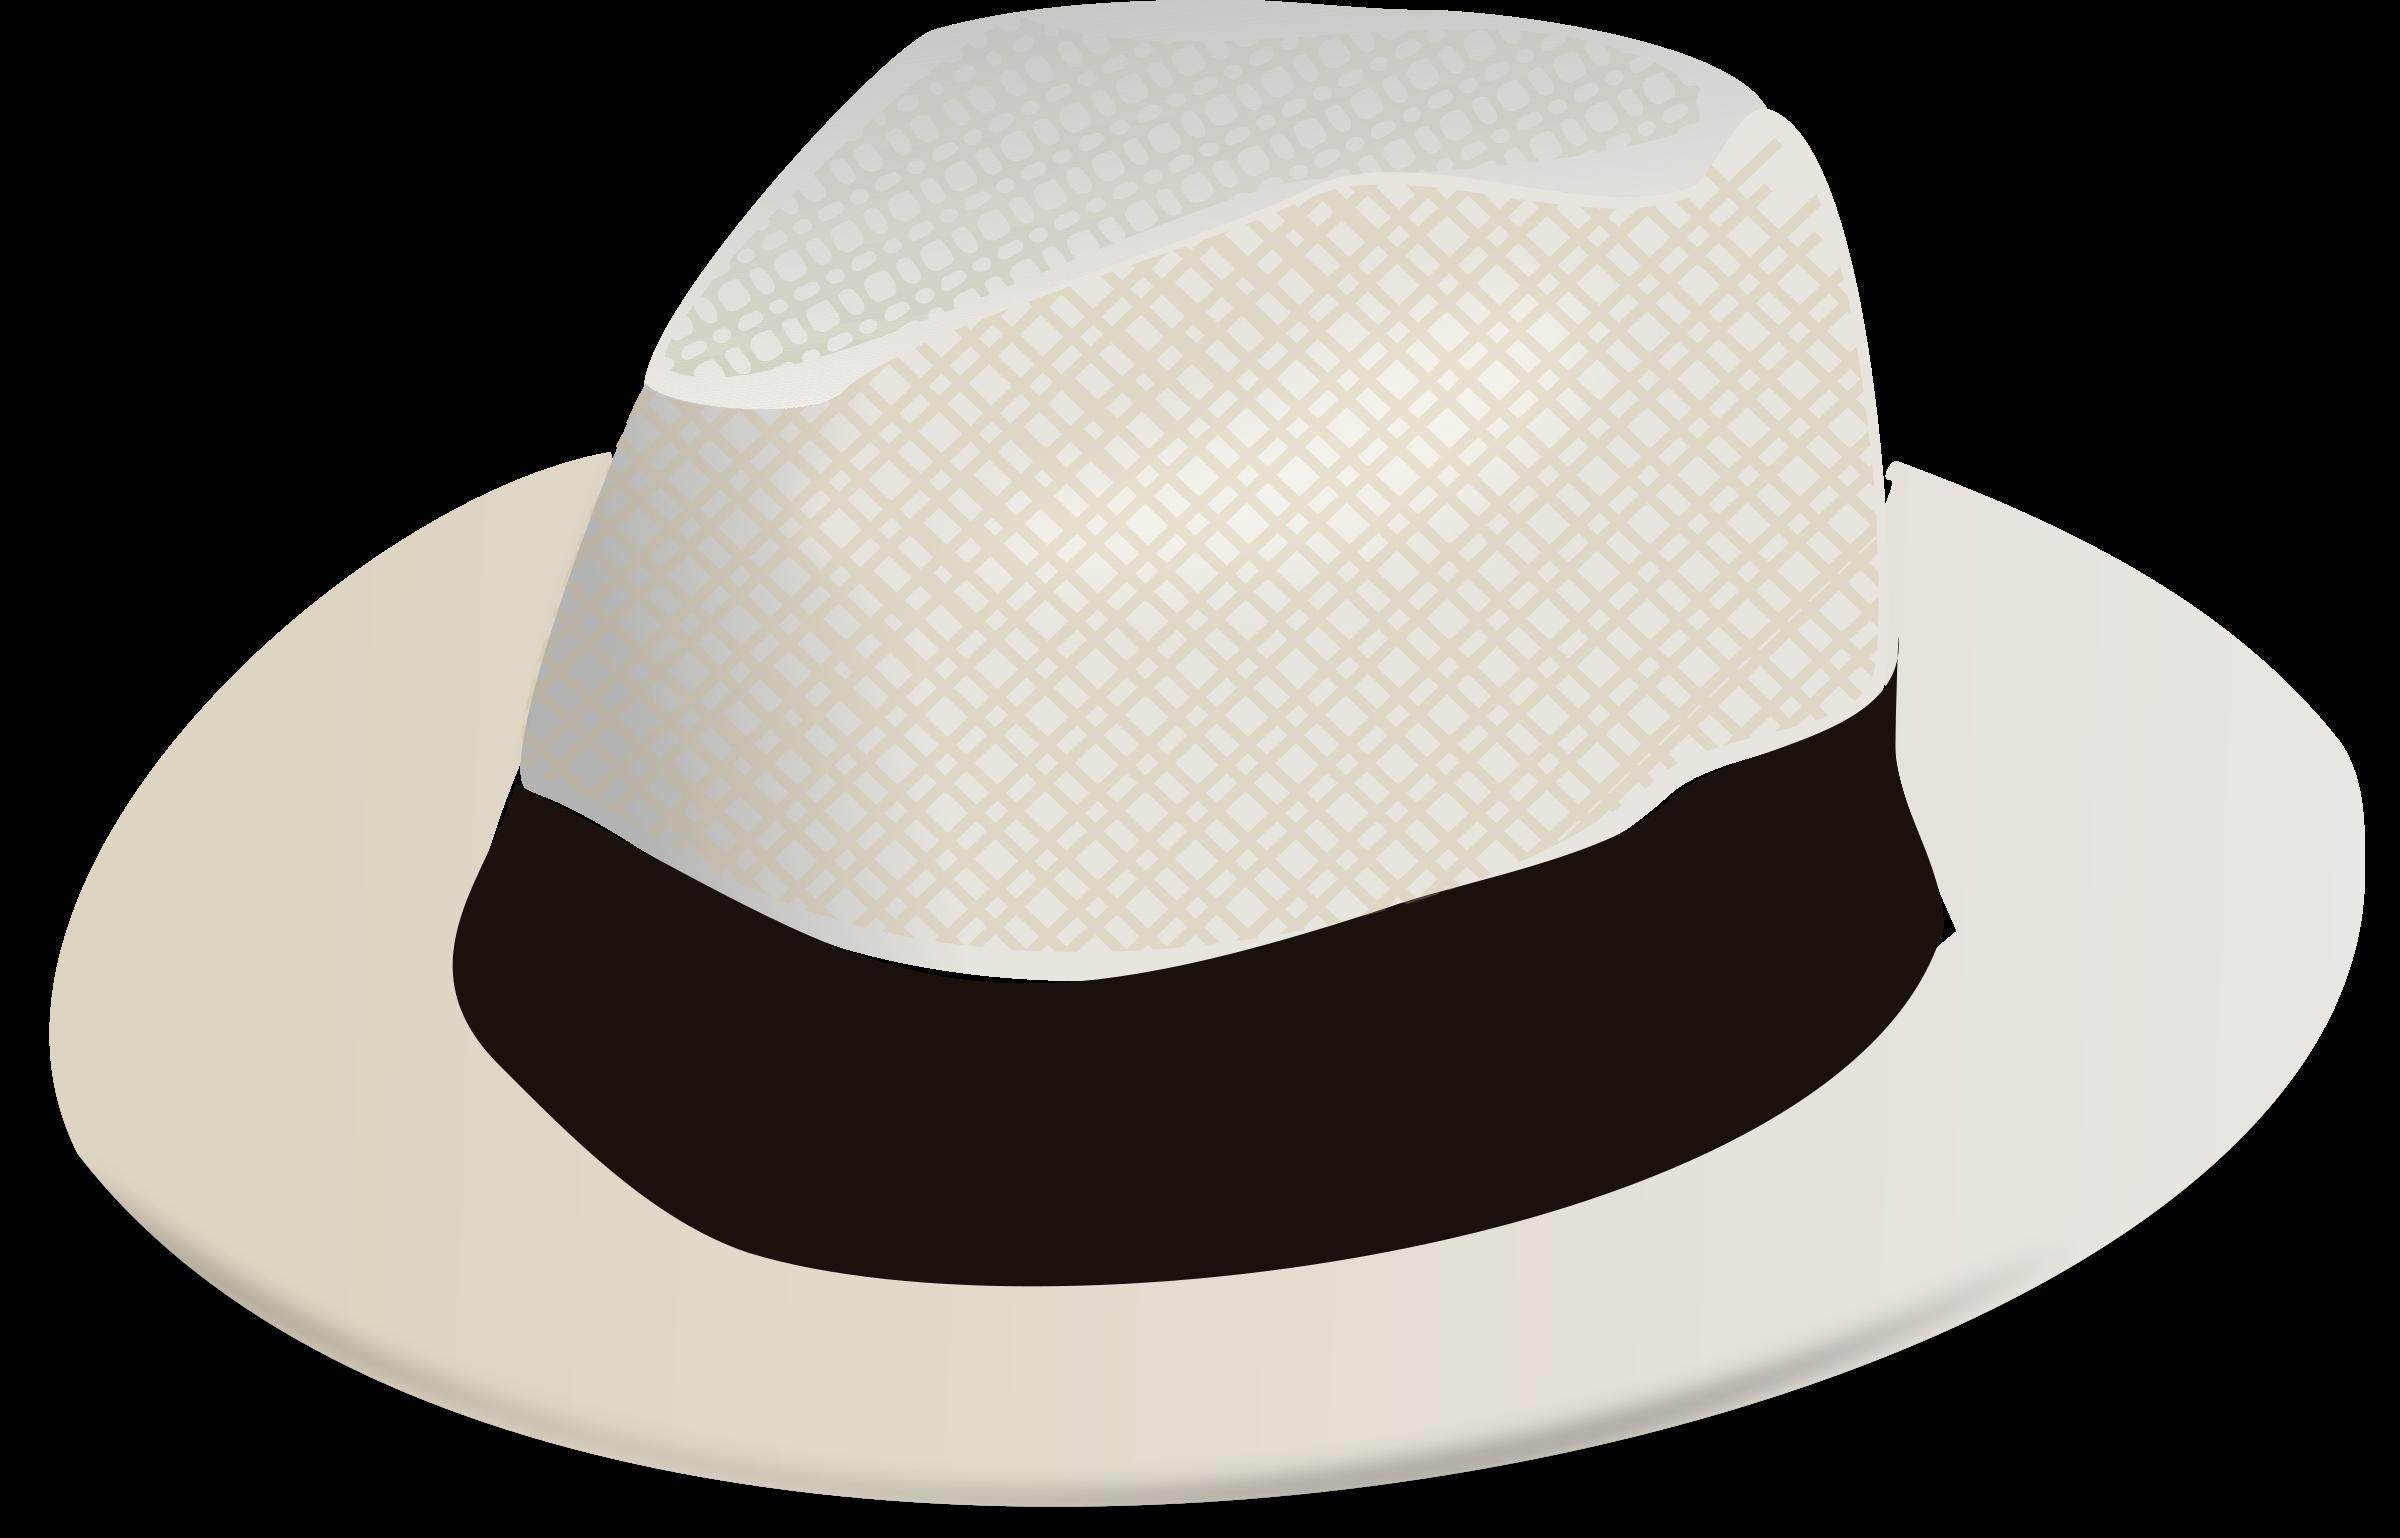 Chapéu panamá emoji